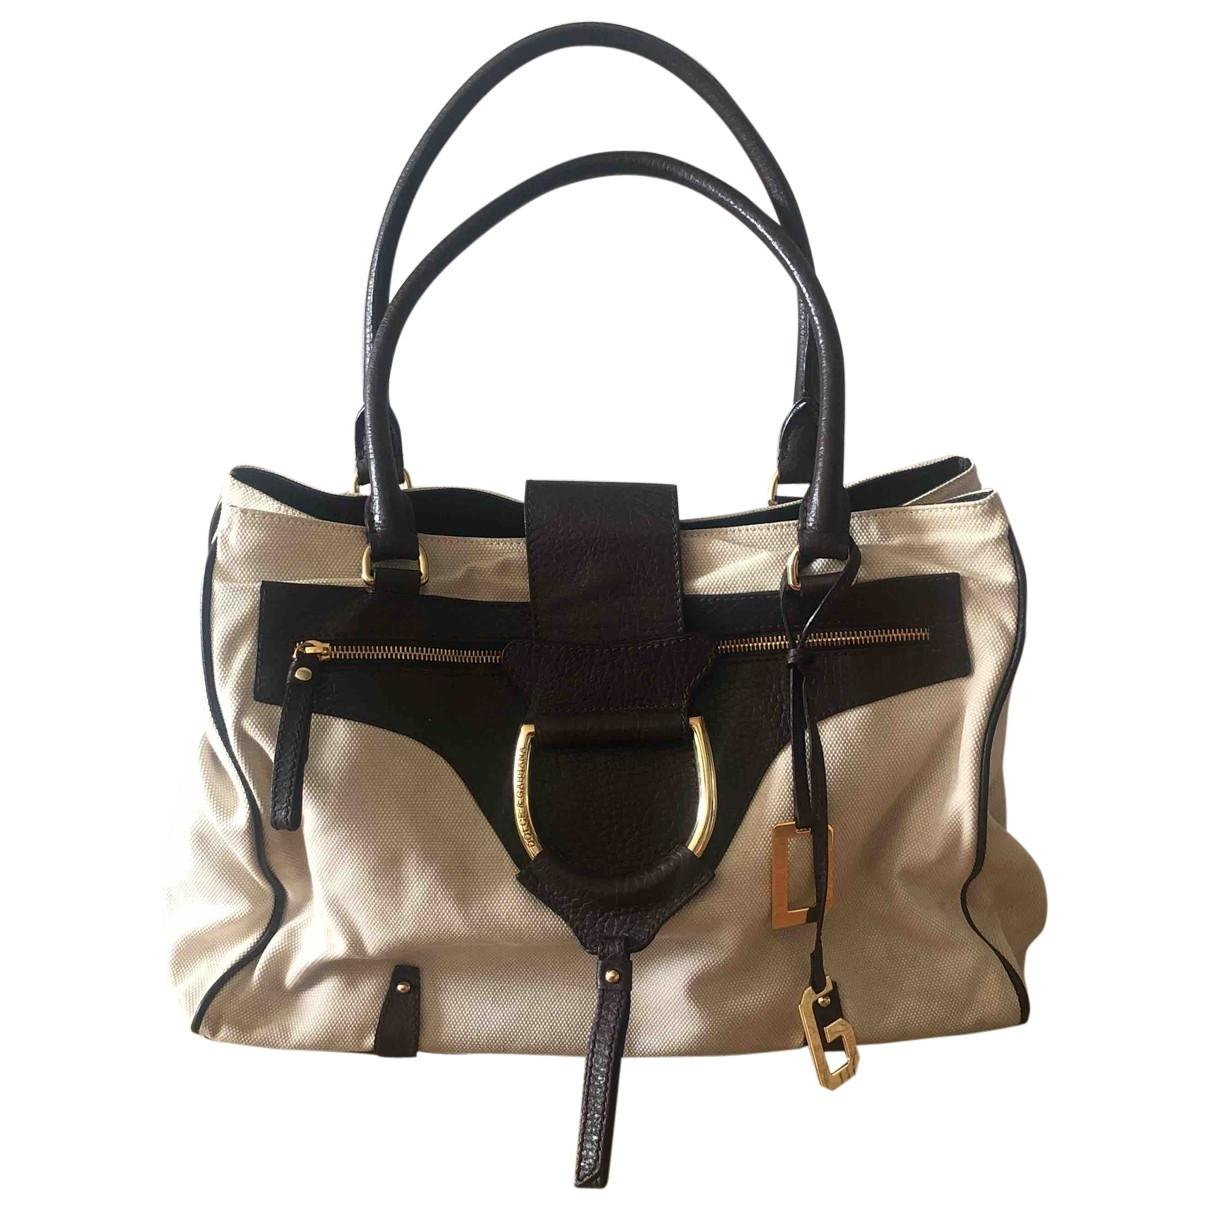 Dolce & Gabbana \N Ecru Cloth handbag for Women \N